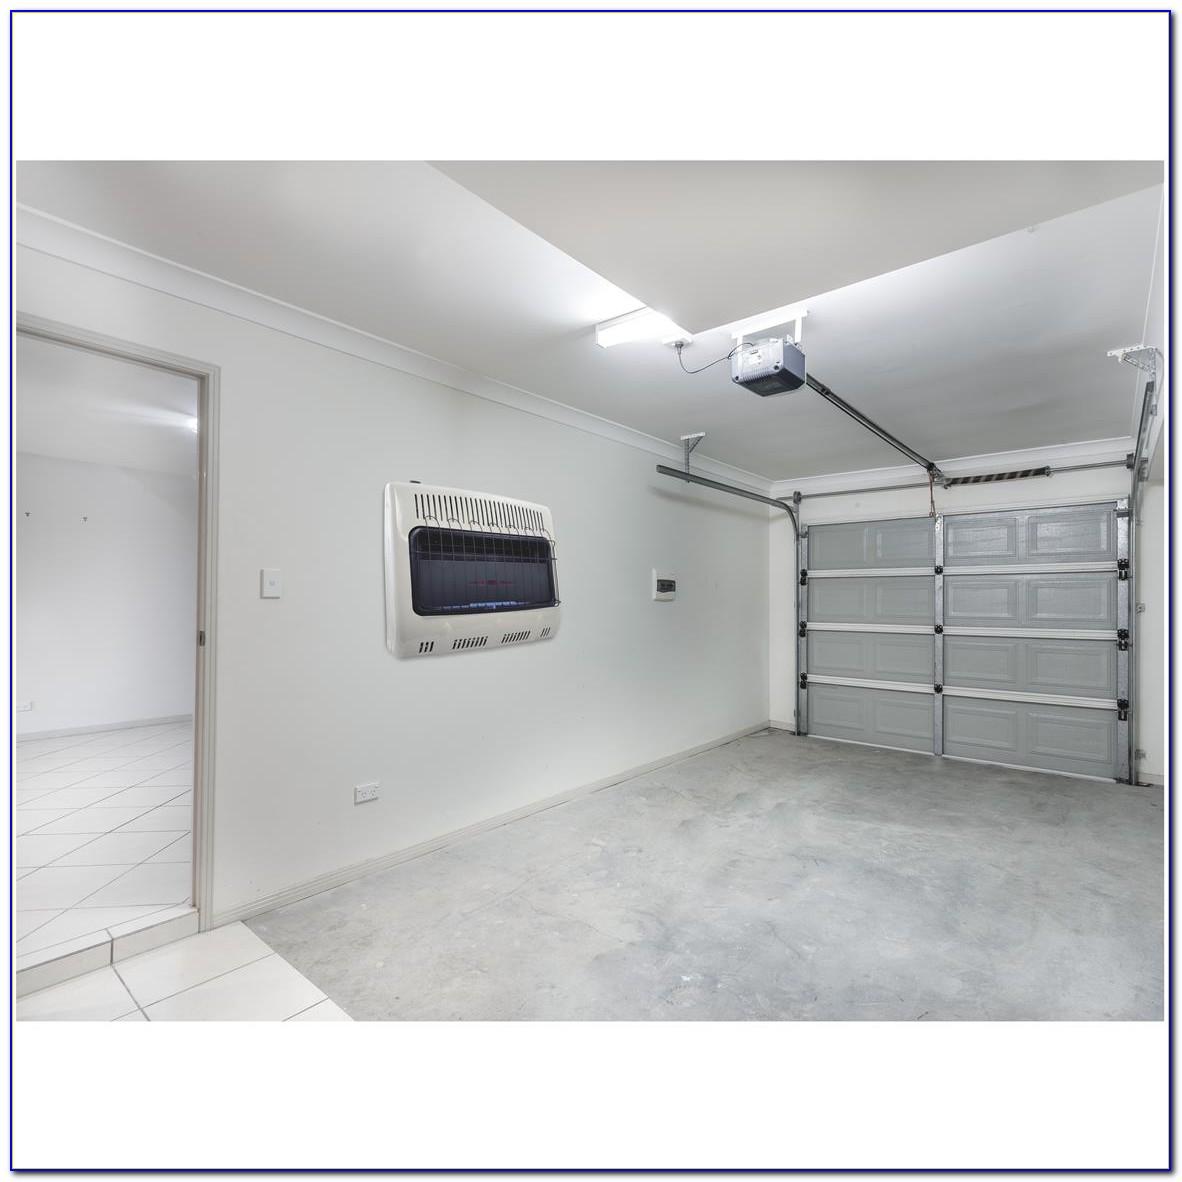 Ceiling Mounted Electric Fan Heaters